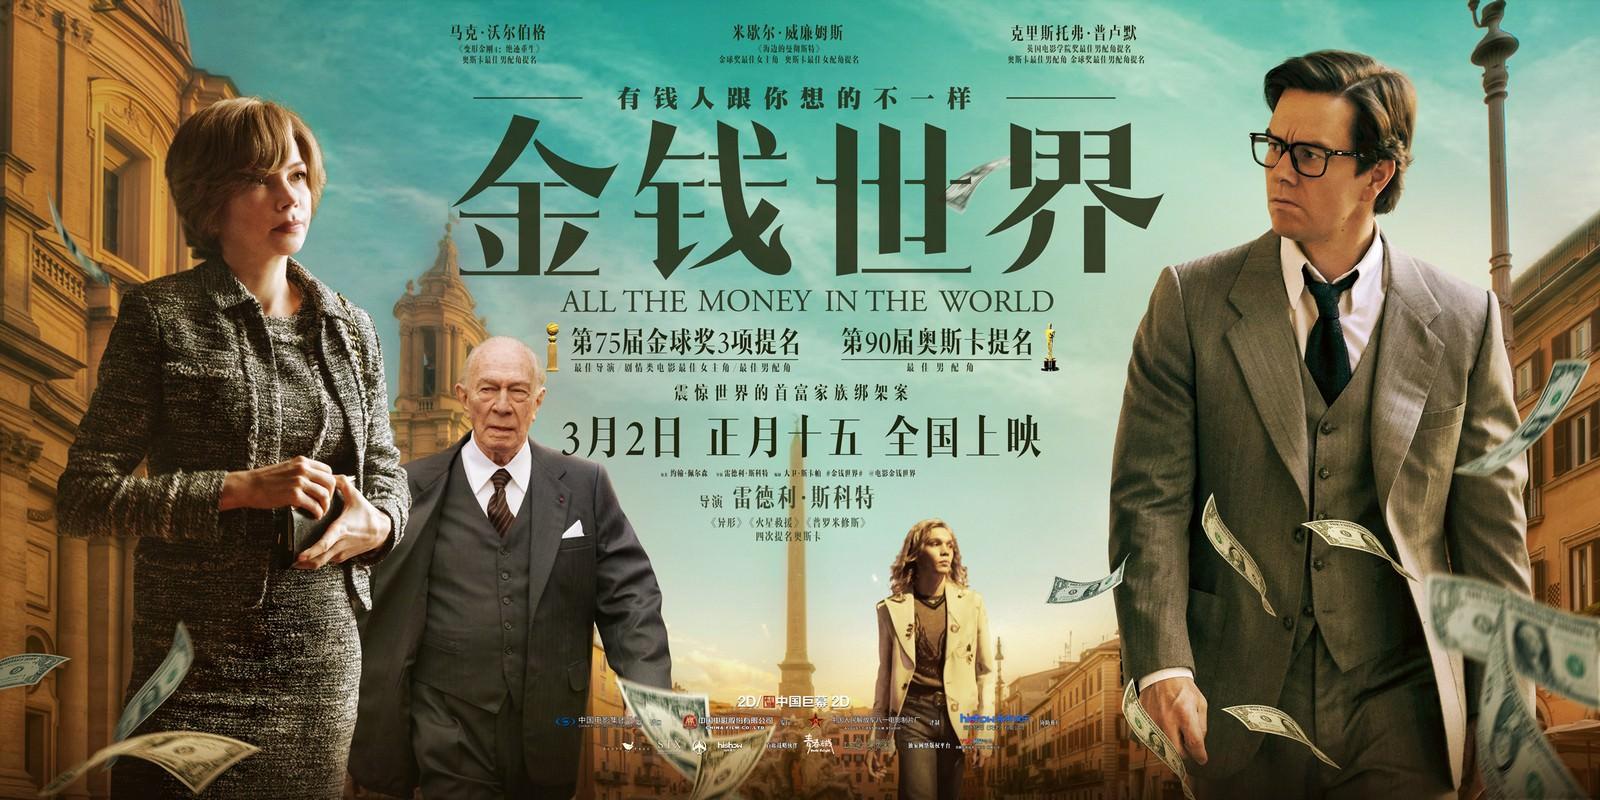 Movie, All the Money in the World(美國.義大利.英國, 2017) / 金錢世界(台) / 金钱世界(中) / 萬惡金錢(港), 電影海報, 中國, 橫版